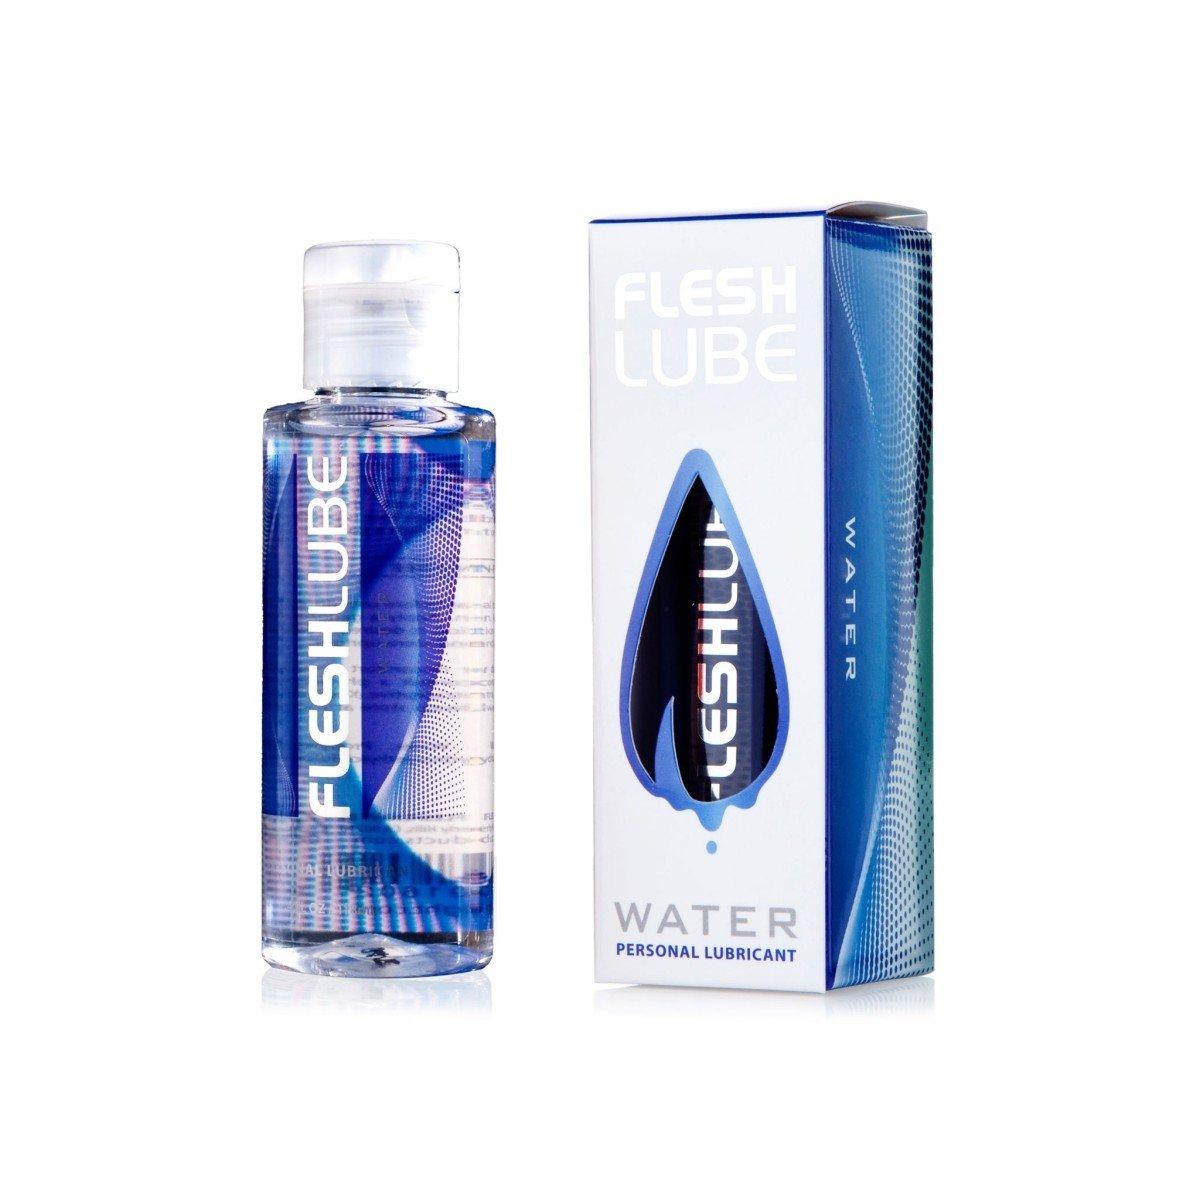 Fleshlight Fleshlube Water 250 ml, lubrikant na vodní bázi